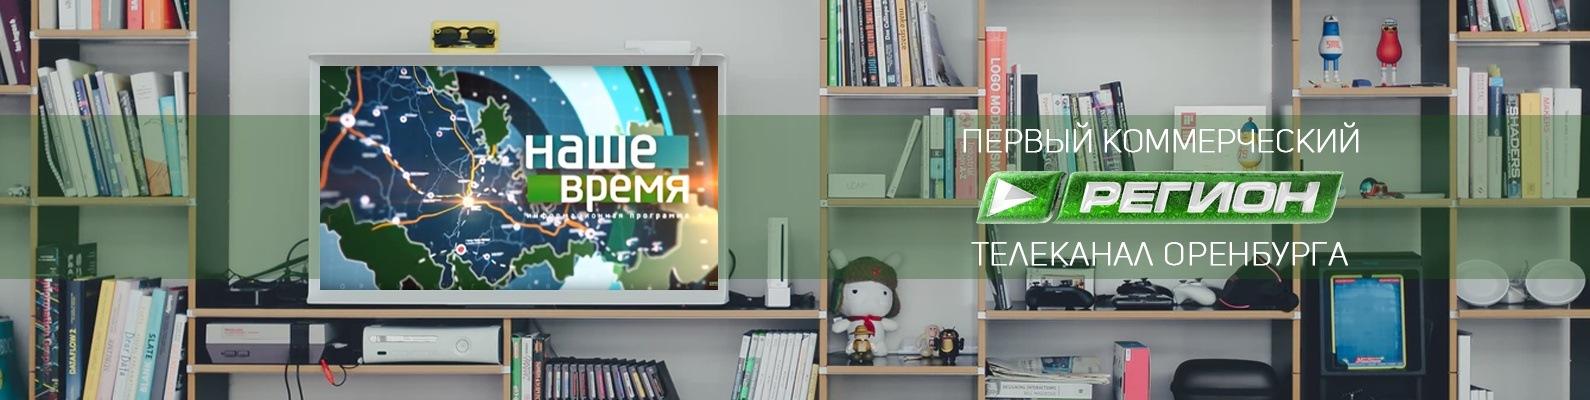 новости оренбурга про берга